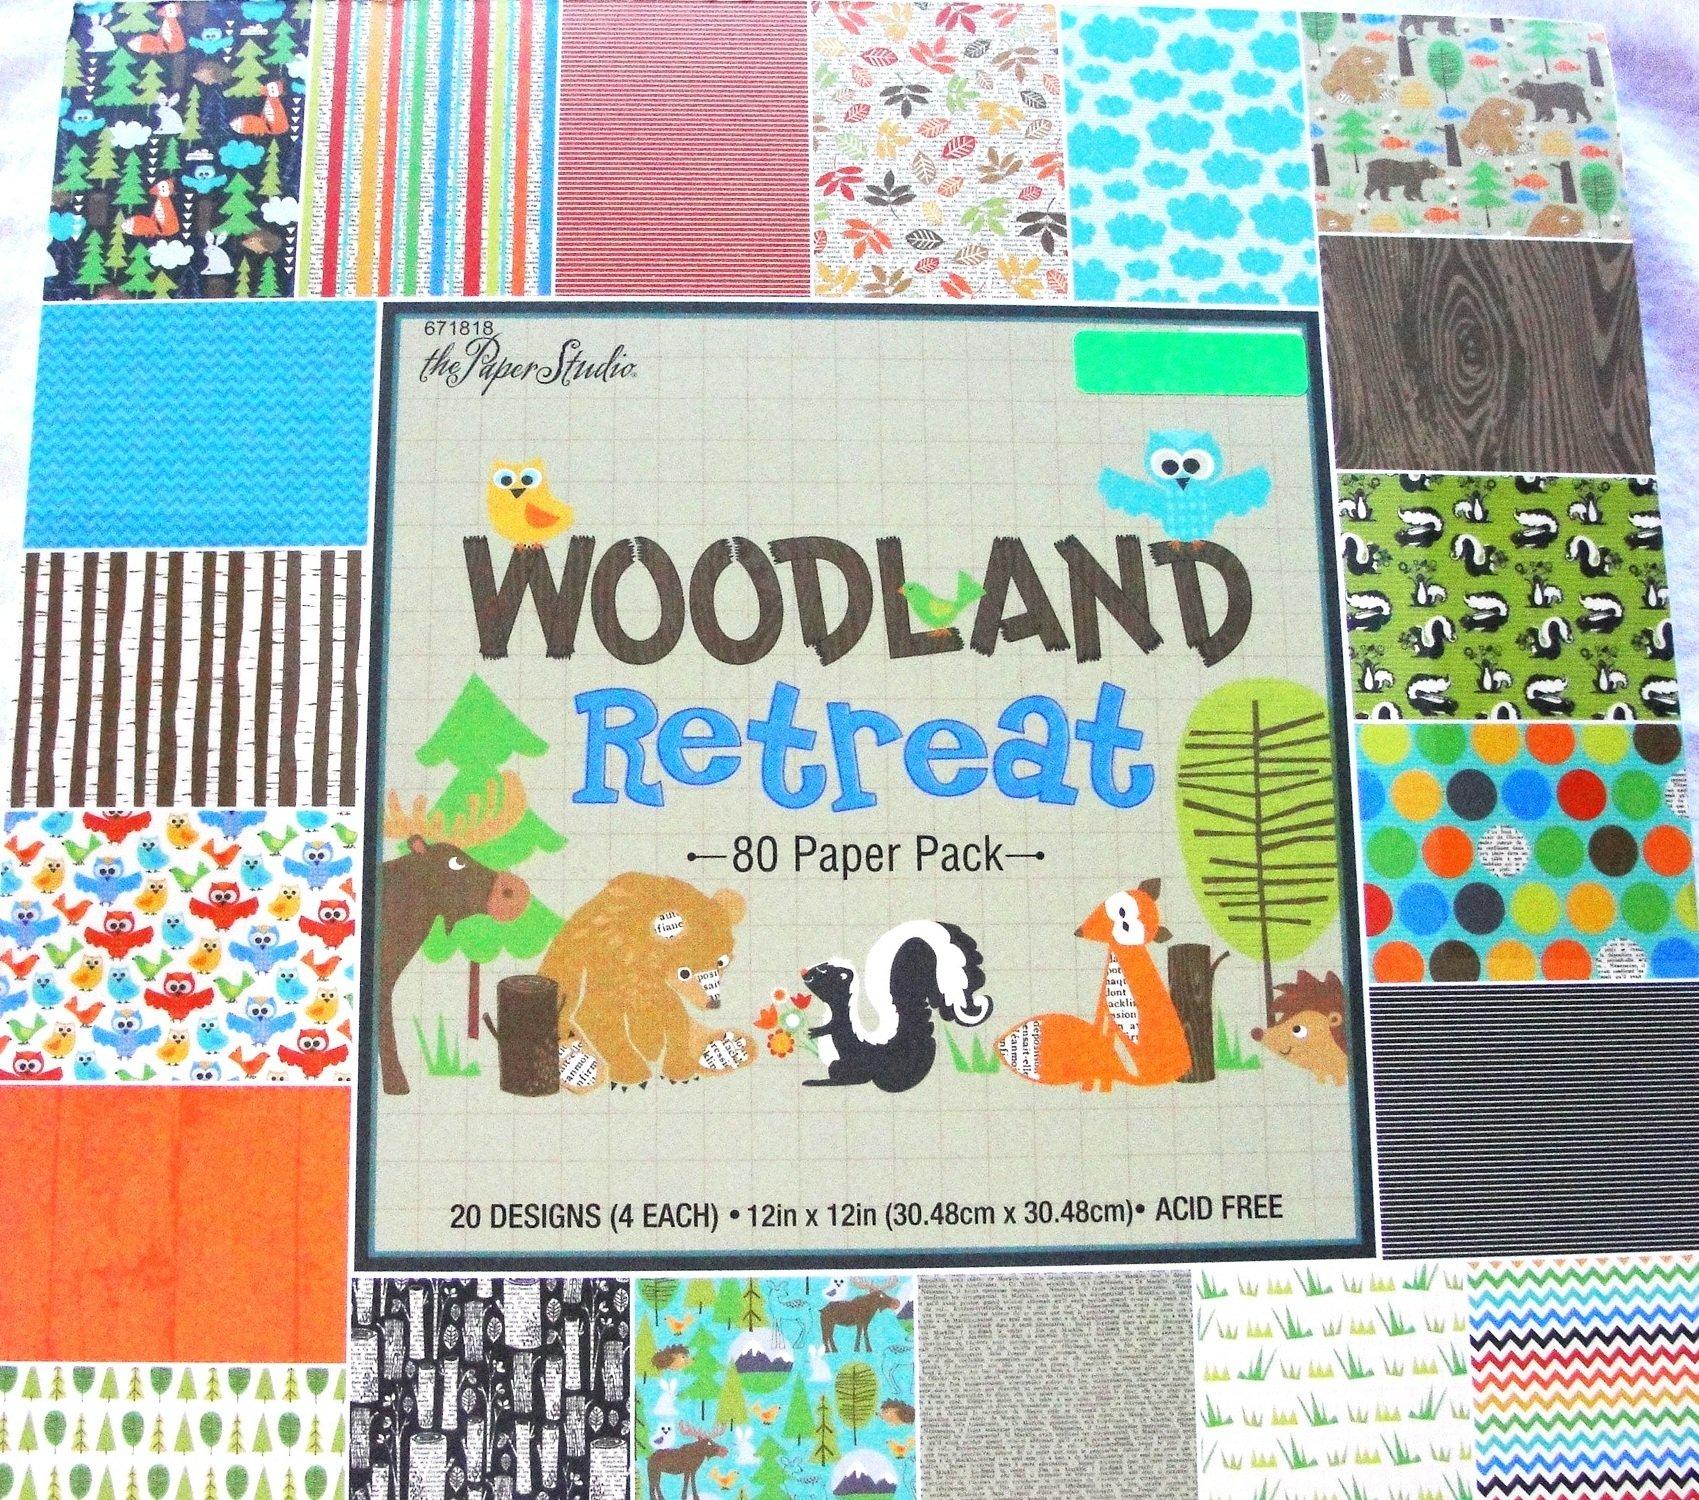 Woodland Retreat 12x12 Scrapbooking Paper Pack, Fox, Moose, Bear, Skunk, Owl, Trees etc. 80 sheets